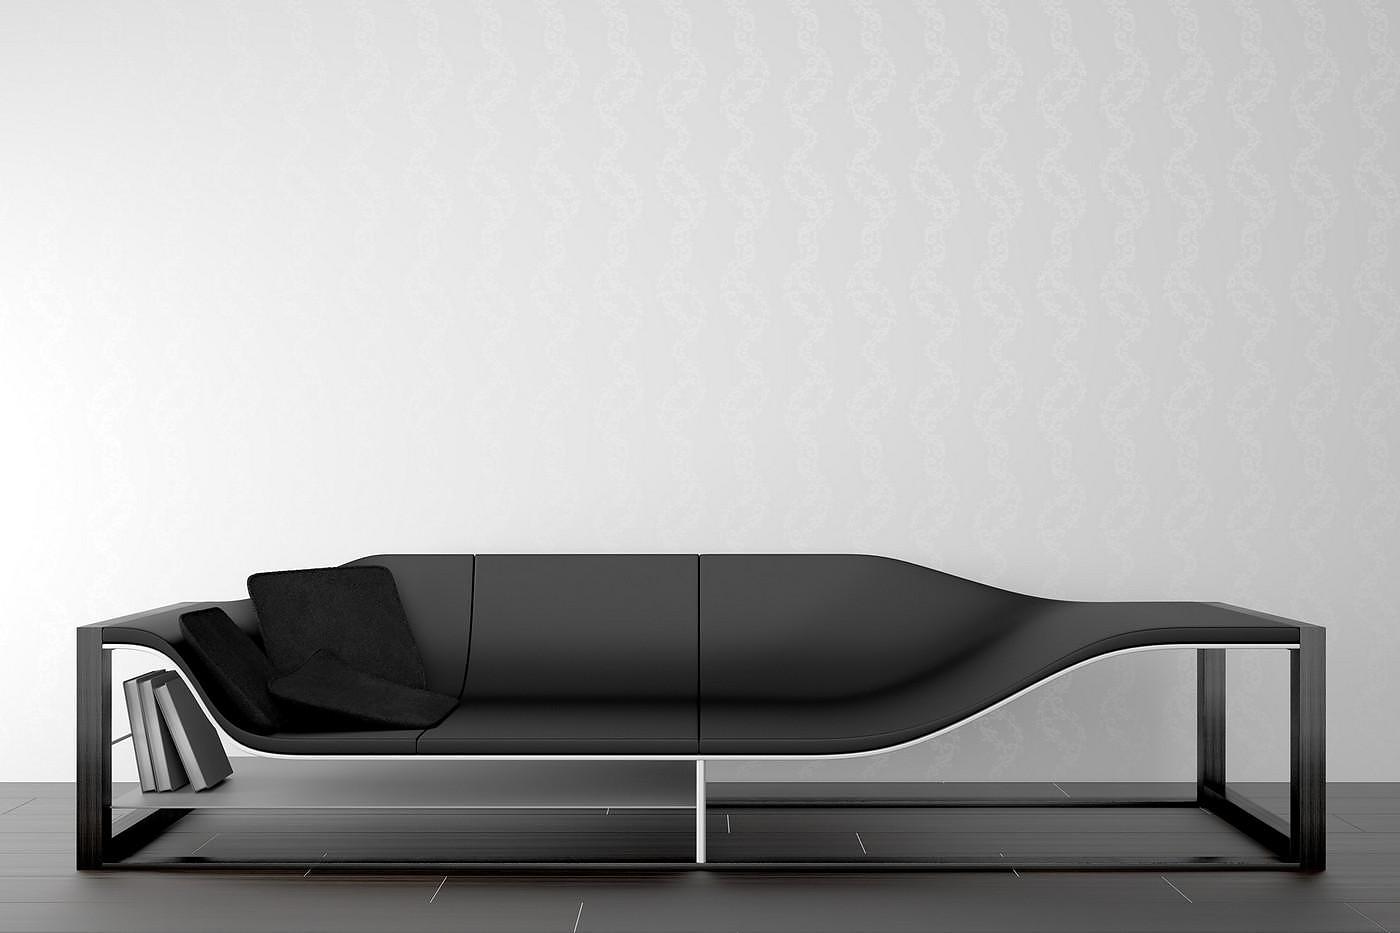 Bucefalo Sofa By Emanuele Canova Design Is This